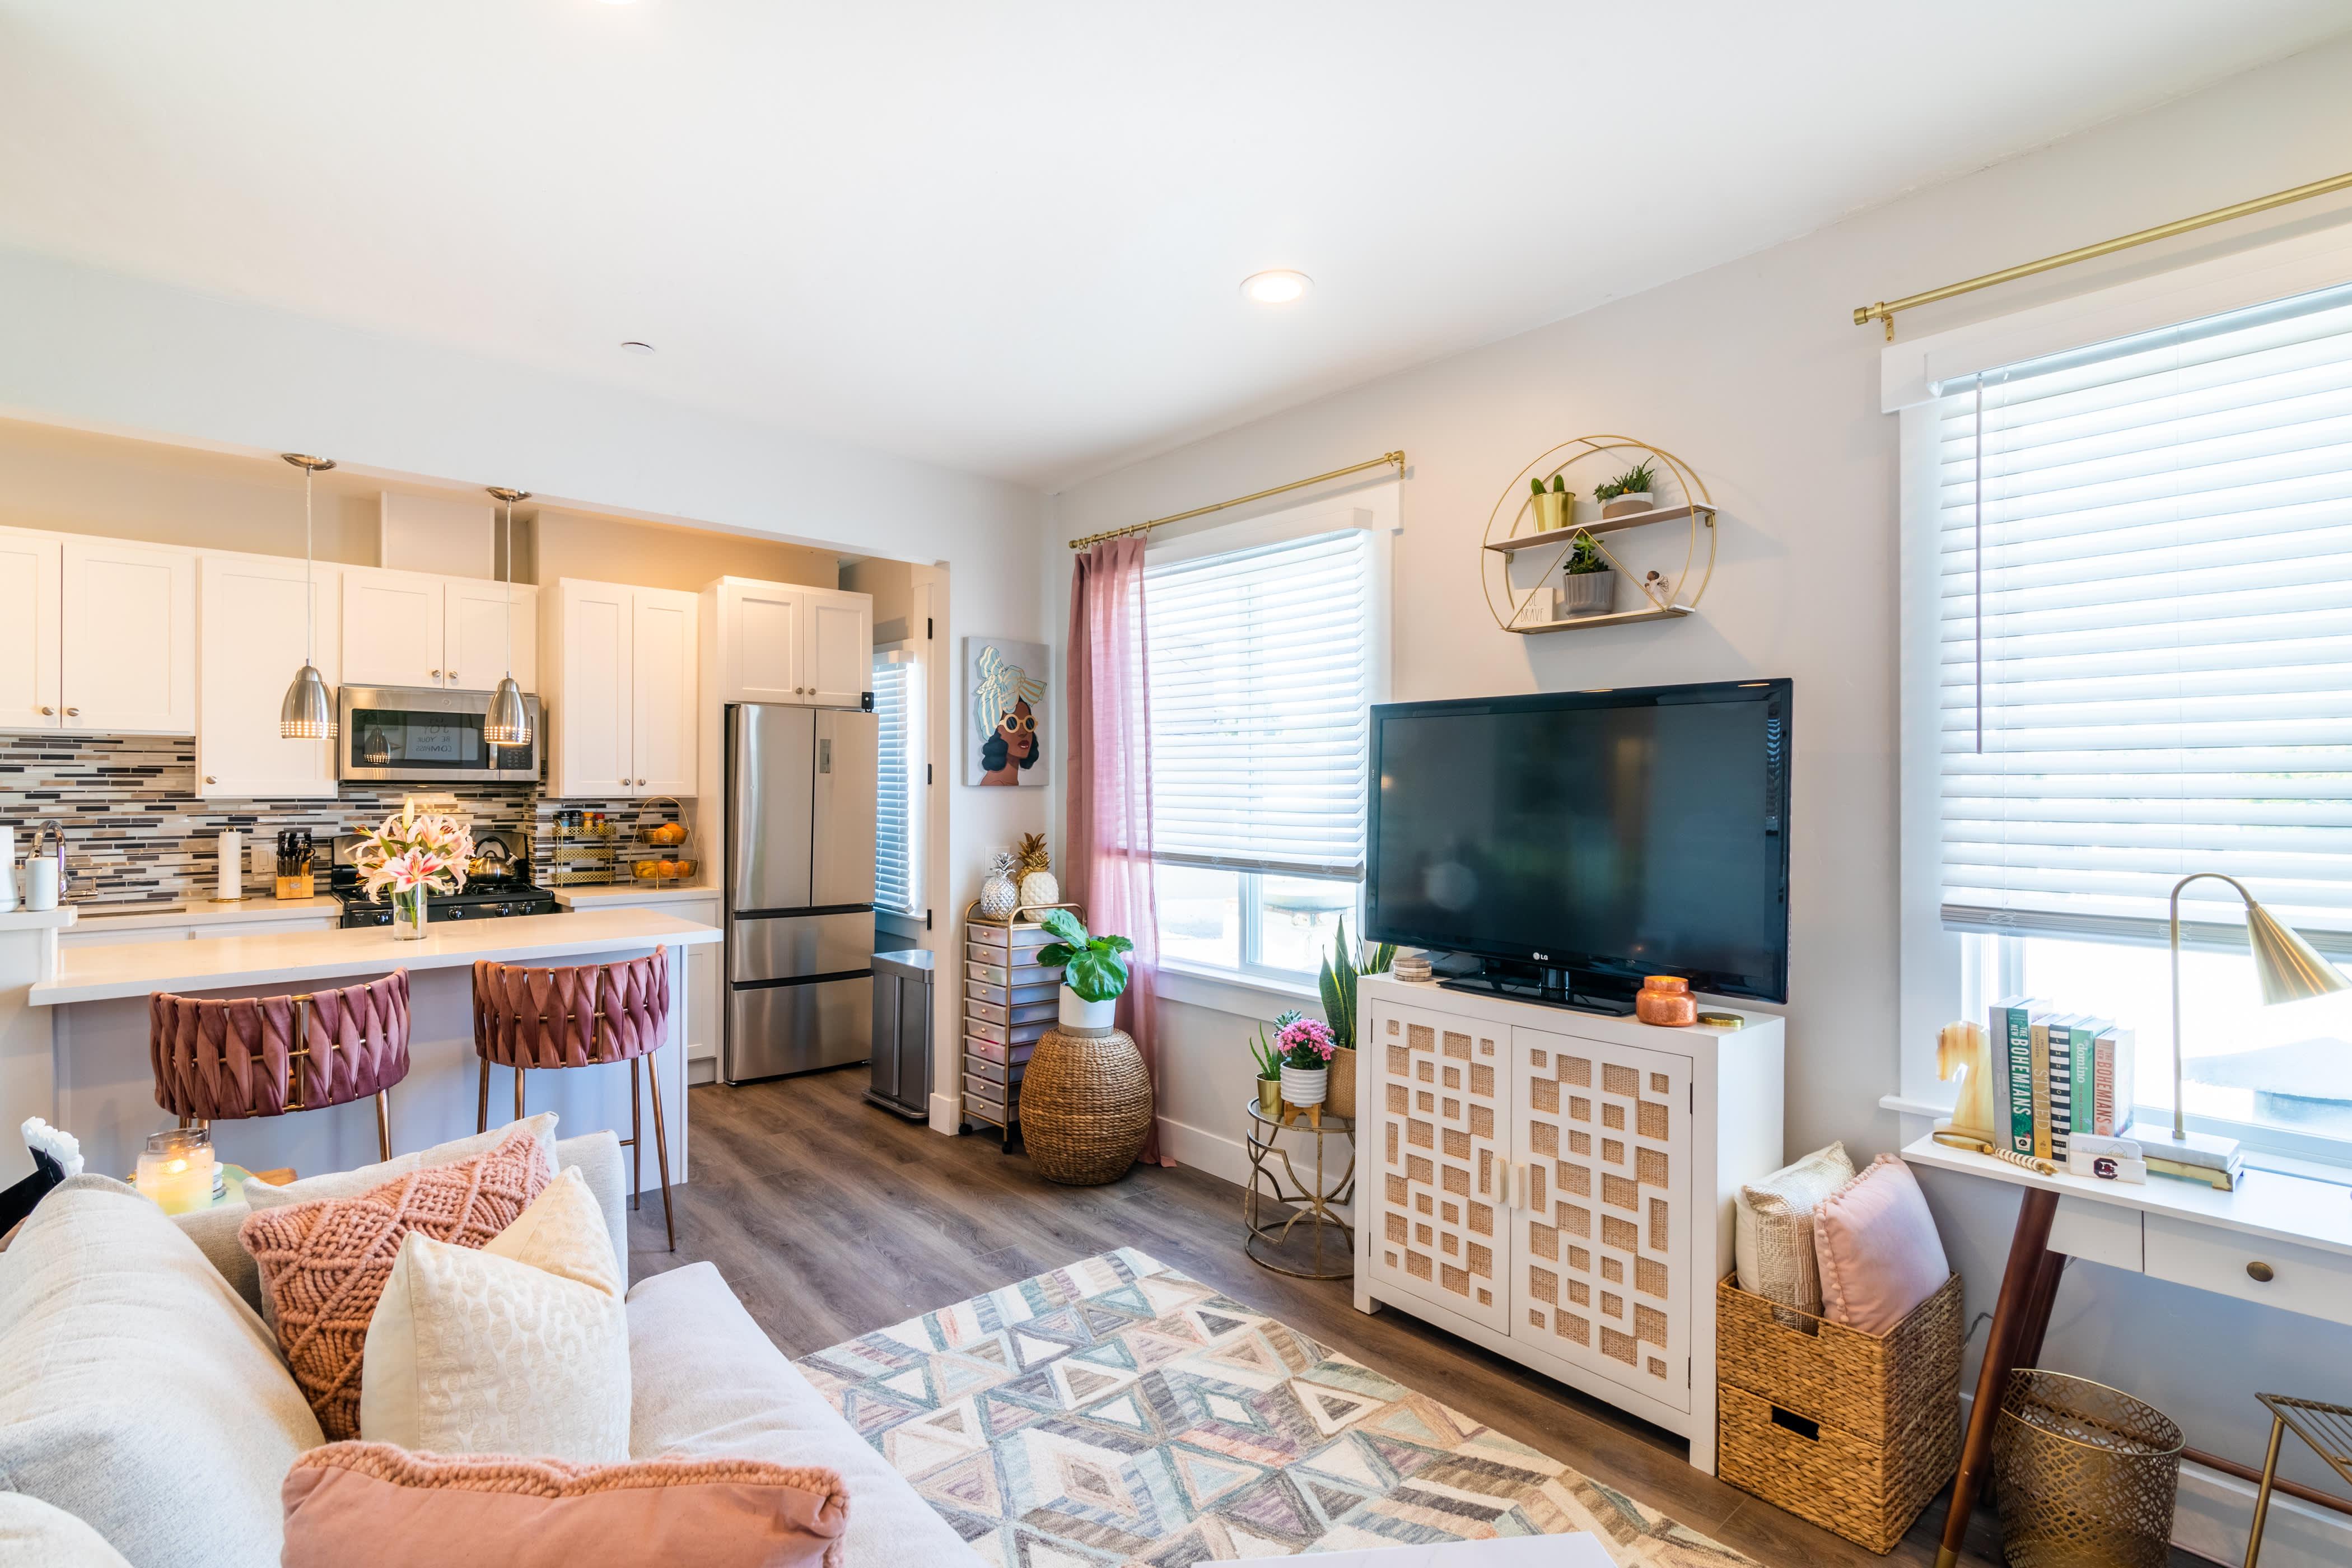 450 Square Foot Rental Apartment Decor Inspiration